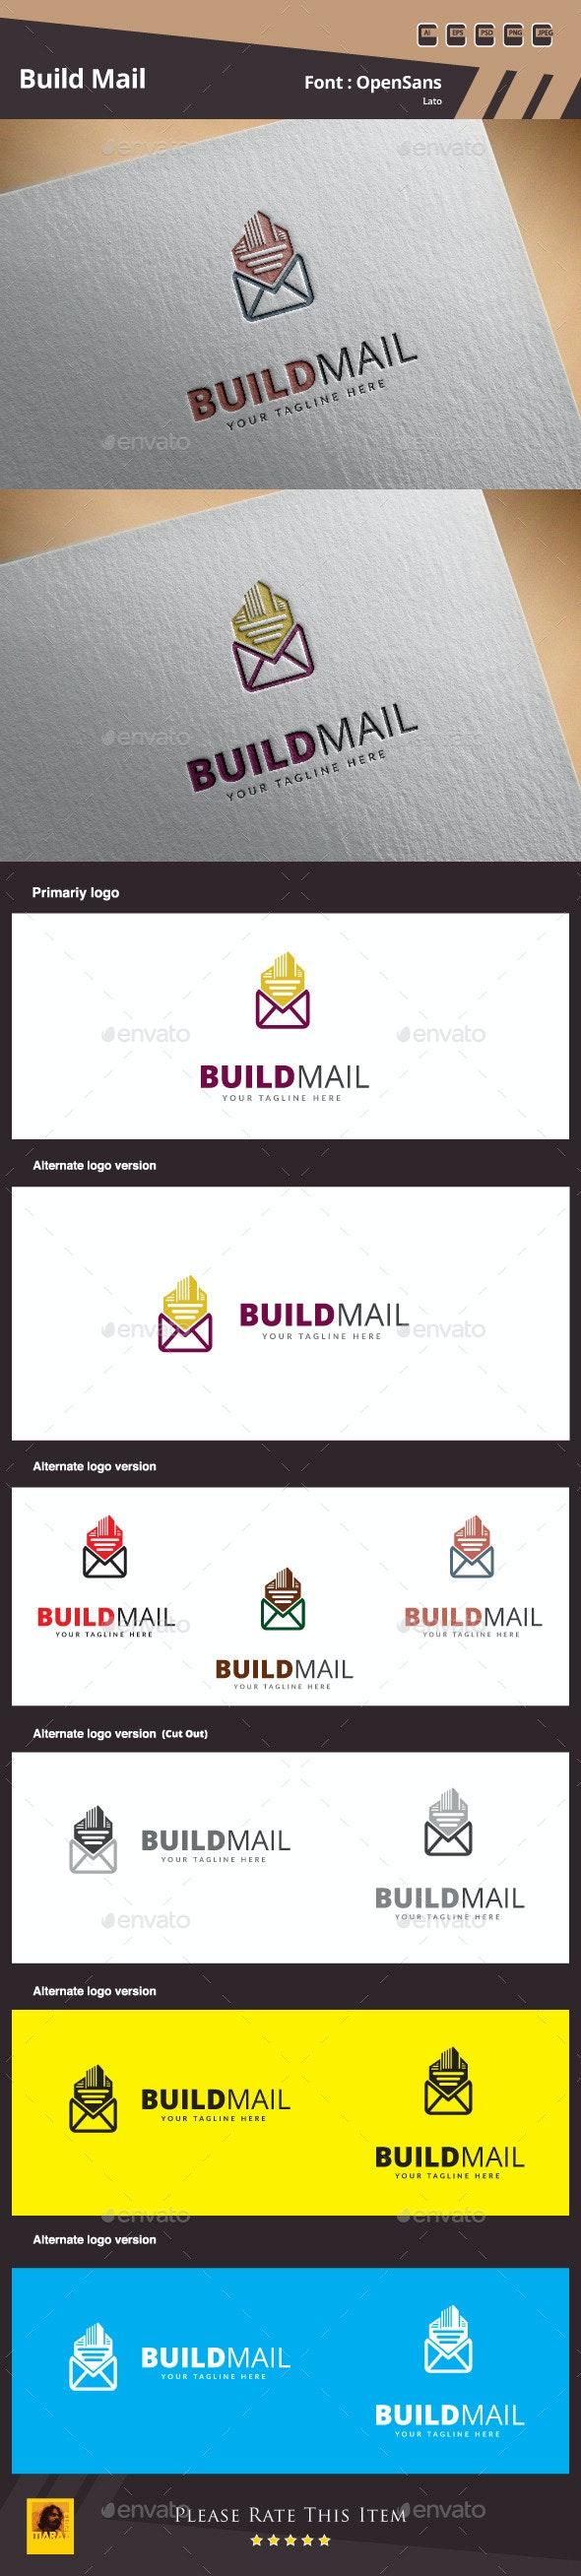 Build Mail Logo Template - Buildings Logo Templates